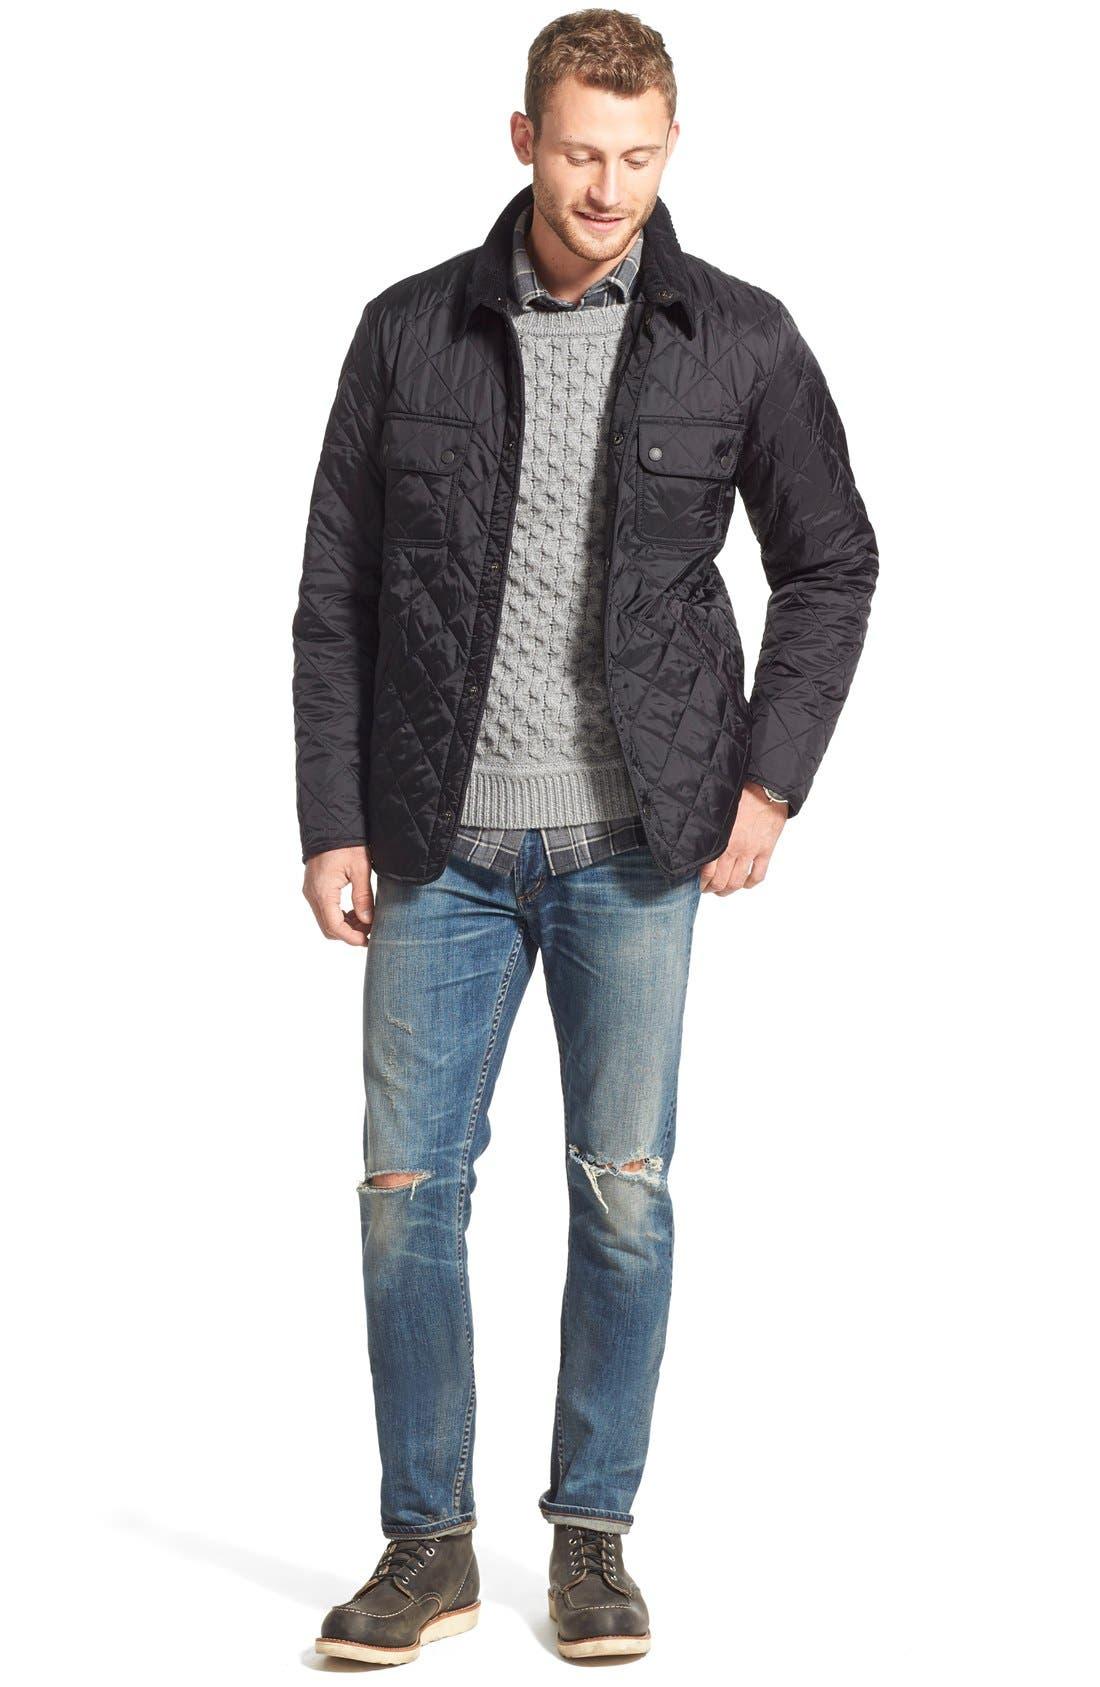 BARBOUR, 'Tinford' Regular Fit Quilted Jacket, Alternate thumbnail 6, color, 001